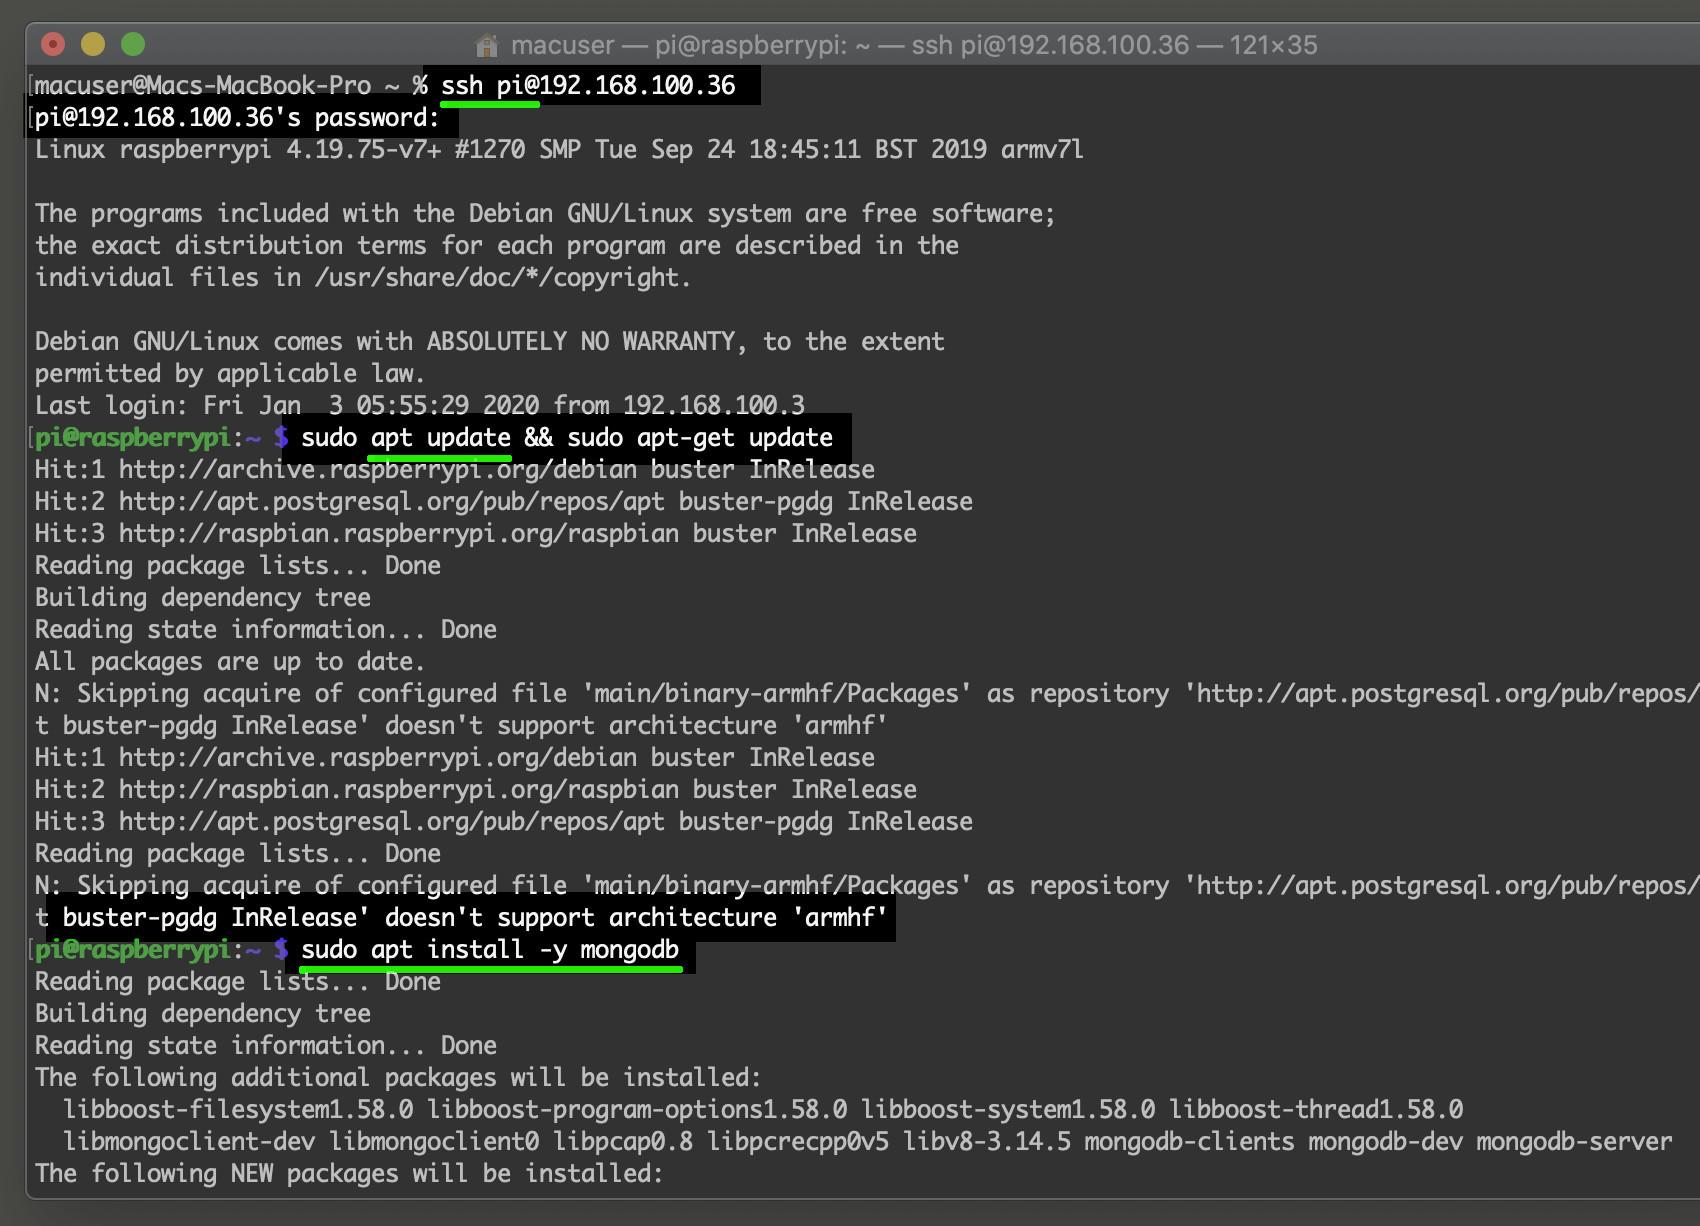 Screenshot of Debian APT repository installing MongoDB on the Raspberry Pi